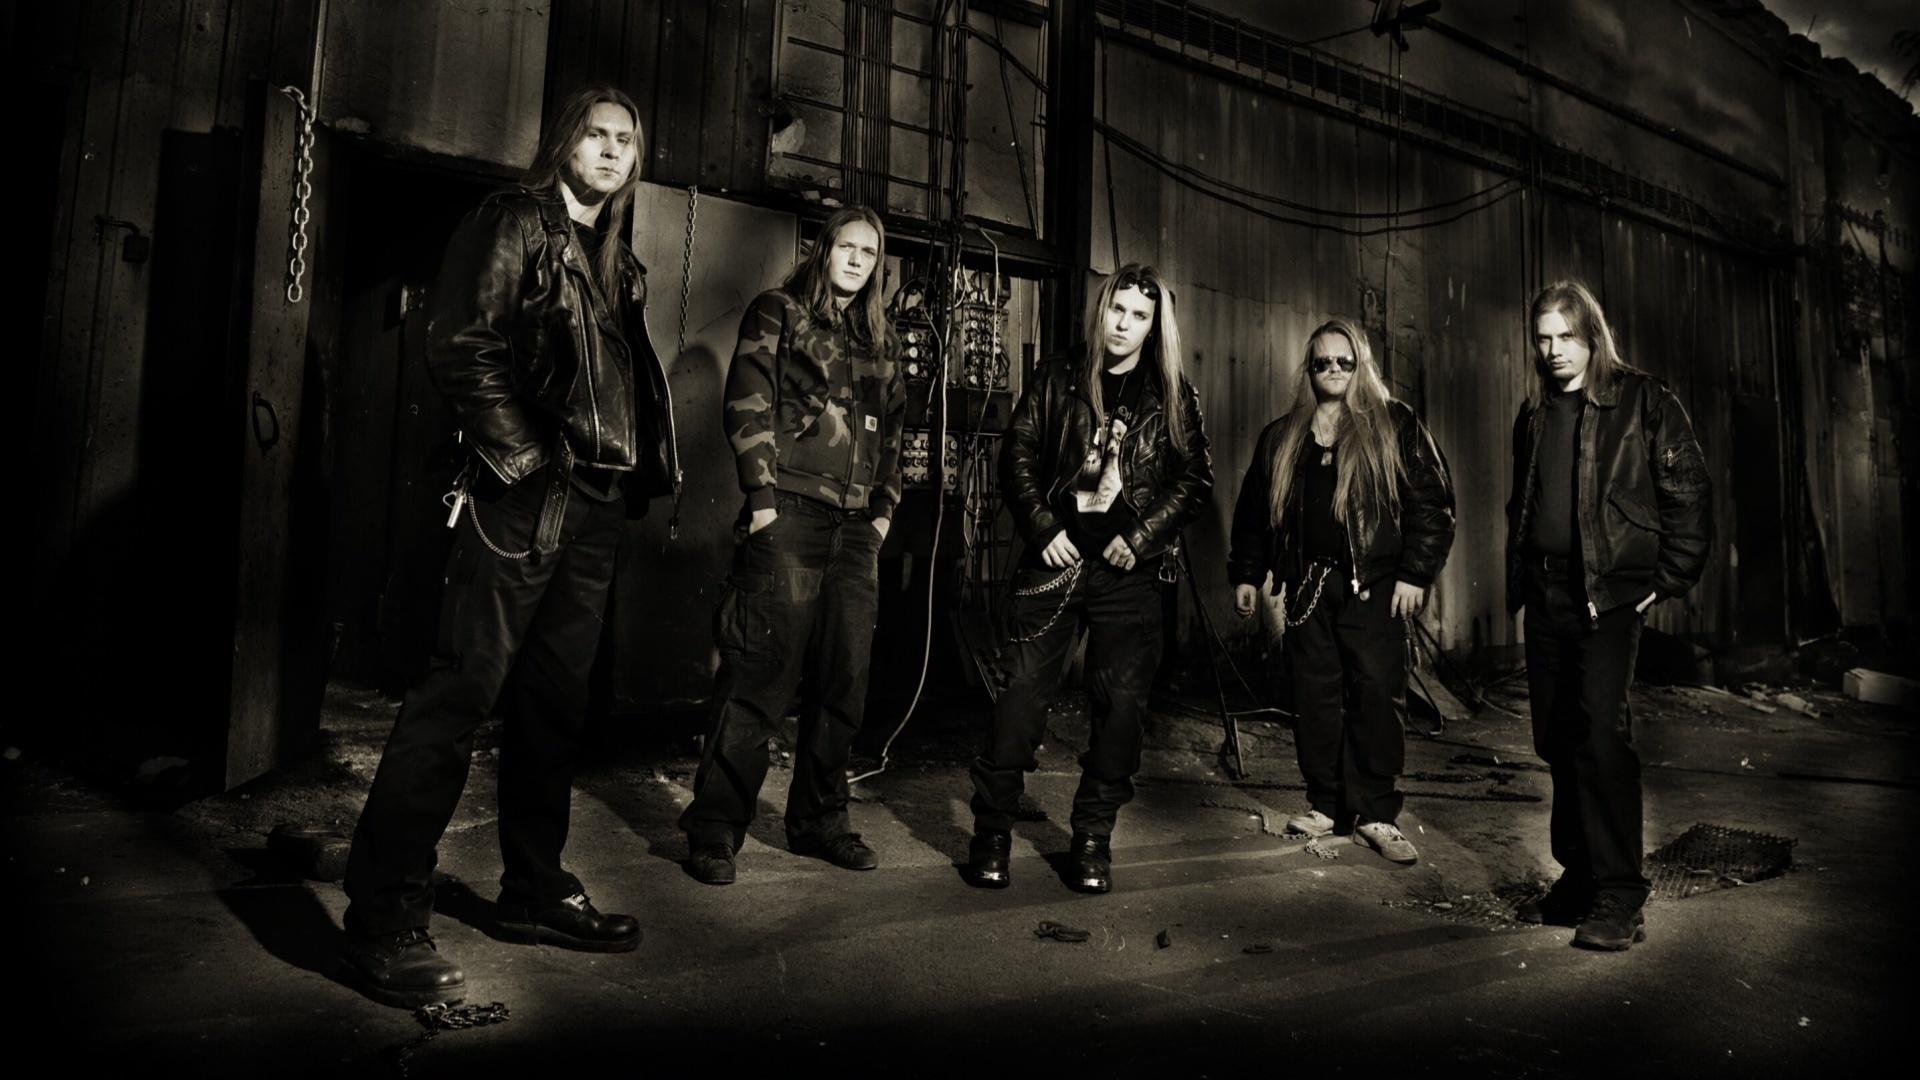 Children Of Bodom(チルドレン・オブ・ボドム): 【絶対おすすめ ...